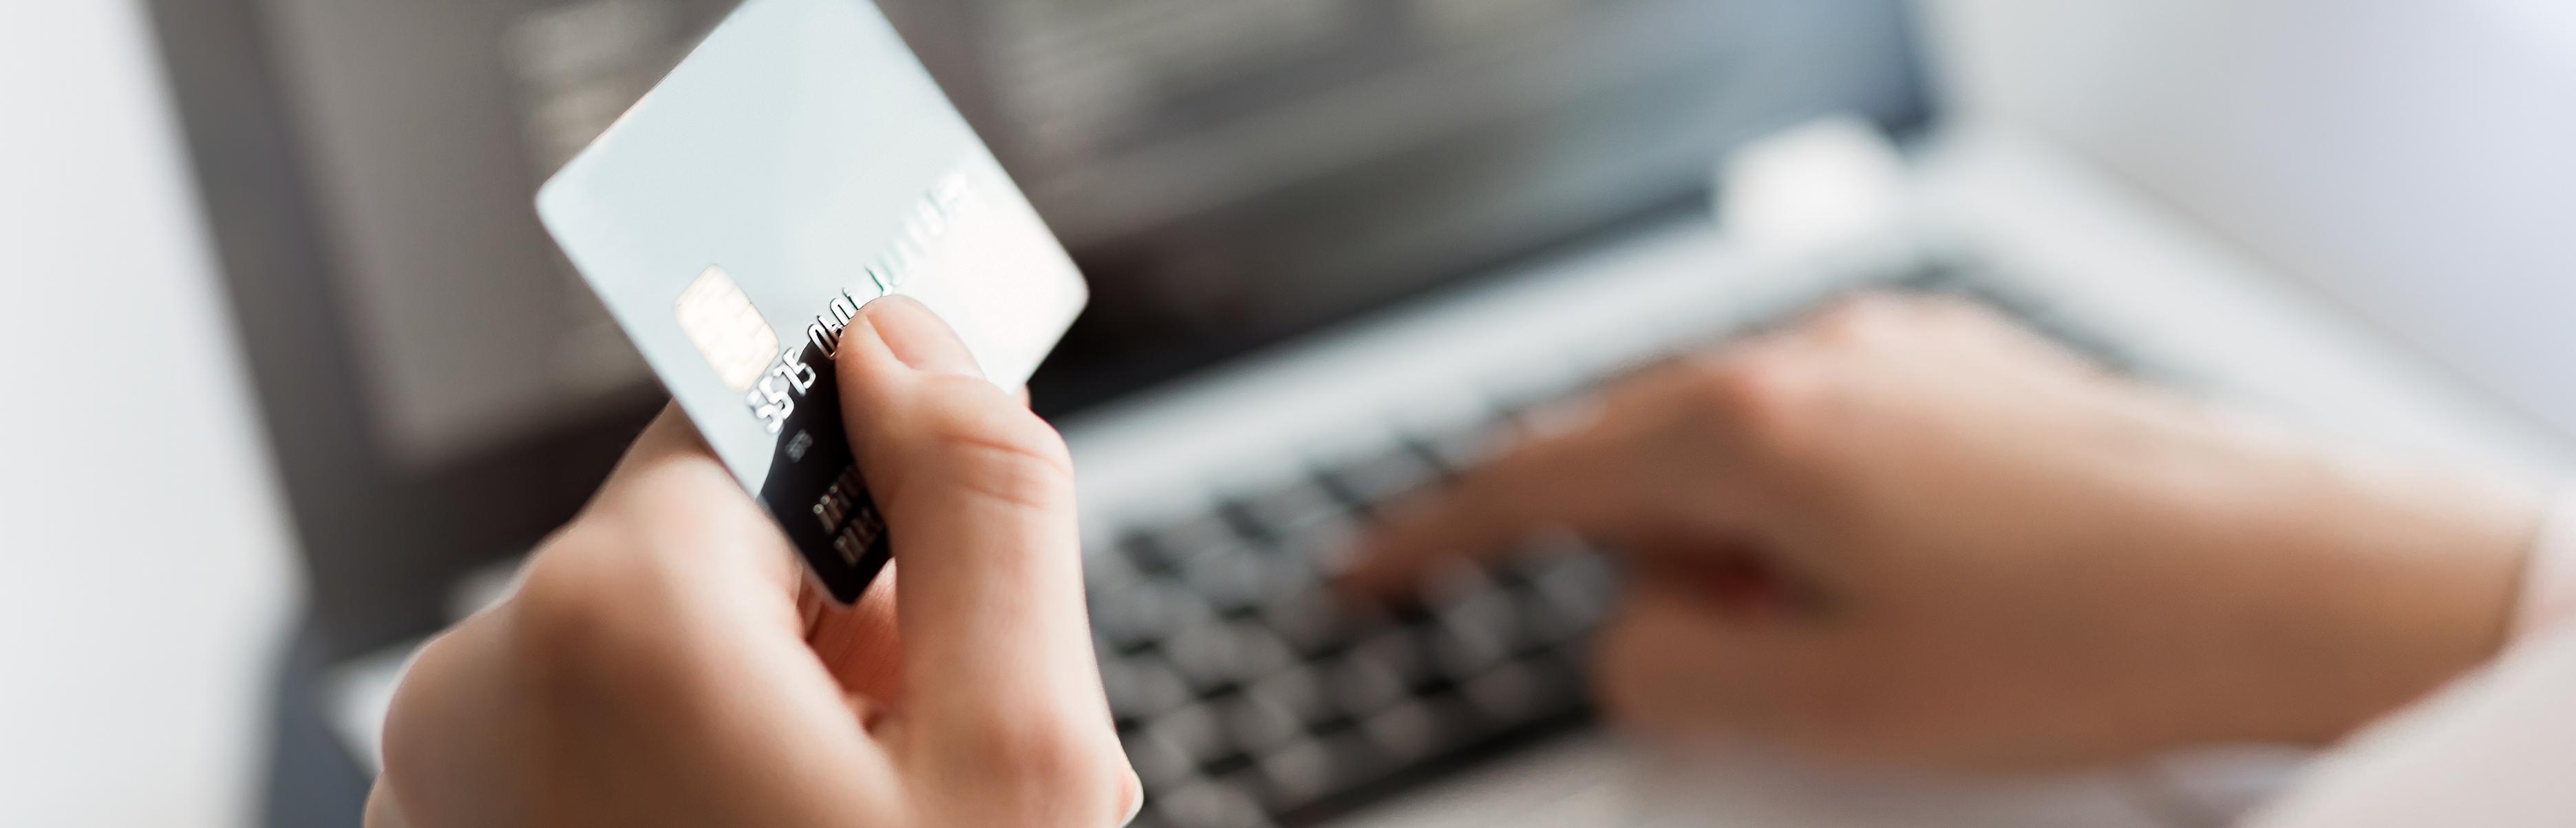 Bank Card Details Being Input Online